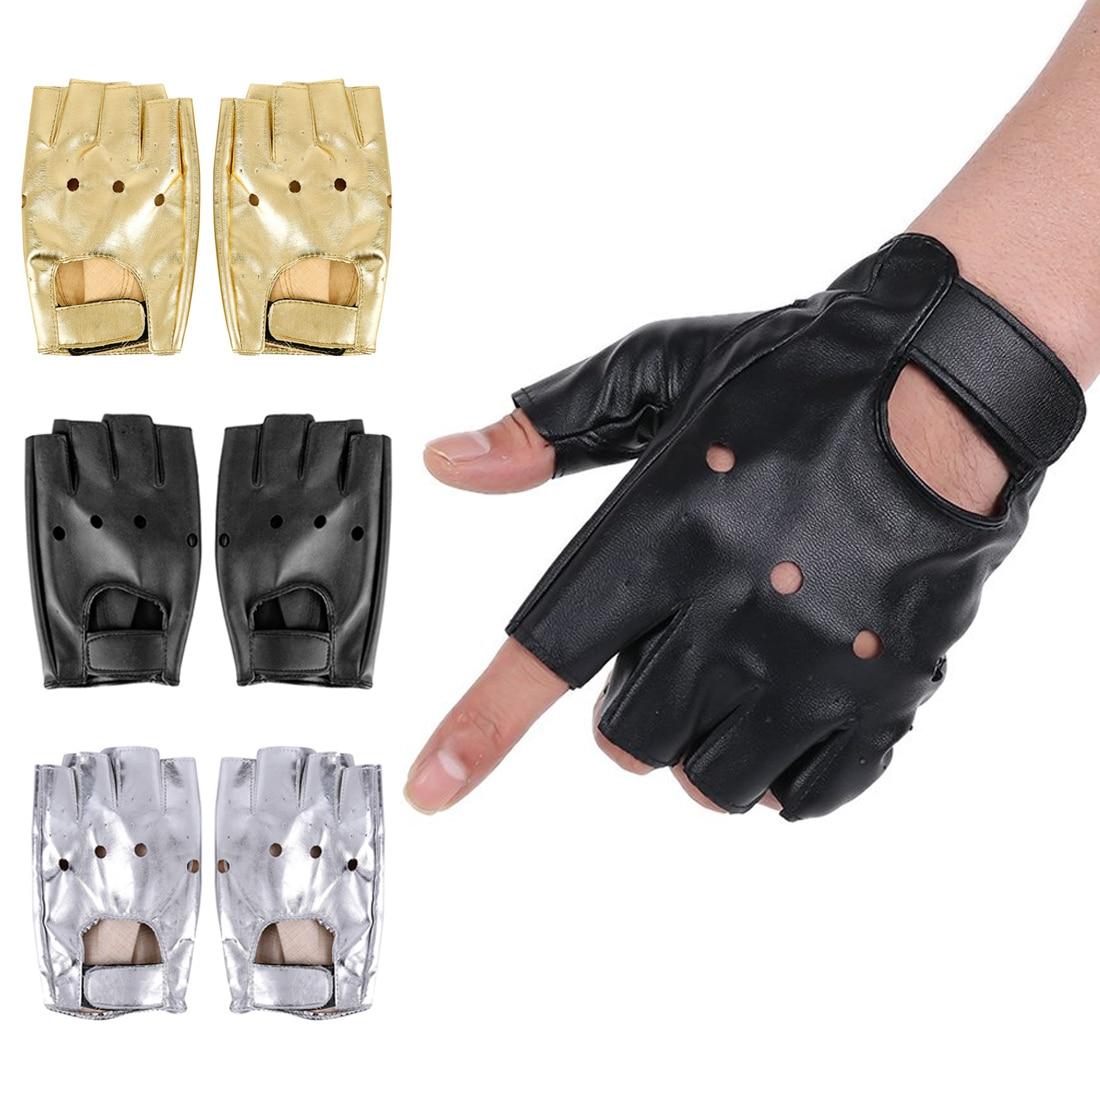 High Qualtiy Leather Gloves For Kids Boy Girls Fingerless Gloves Chilidren Half Finger Mittens Breathable Black Fashion New